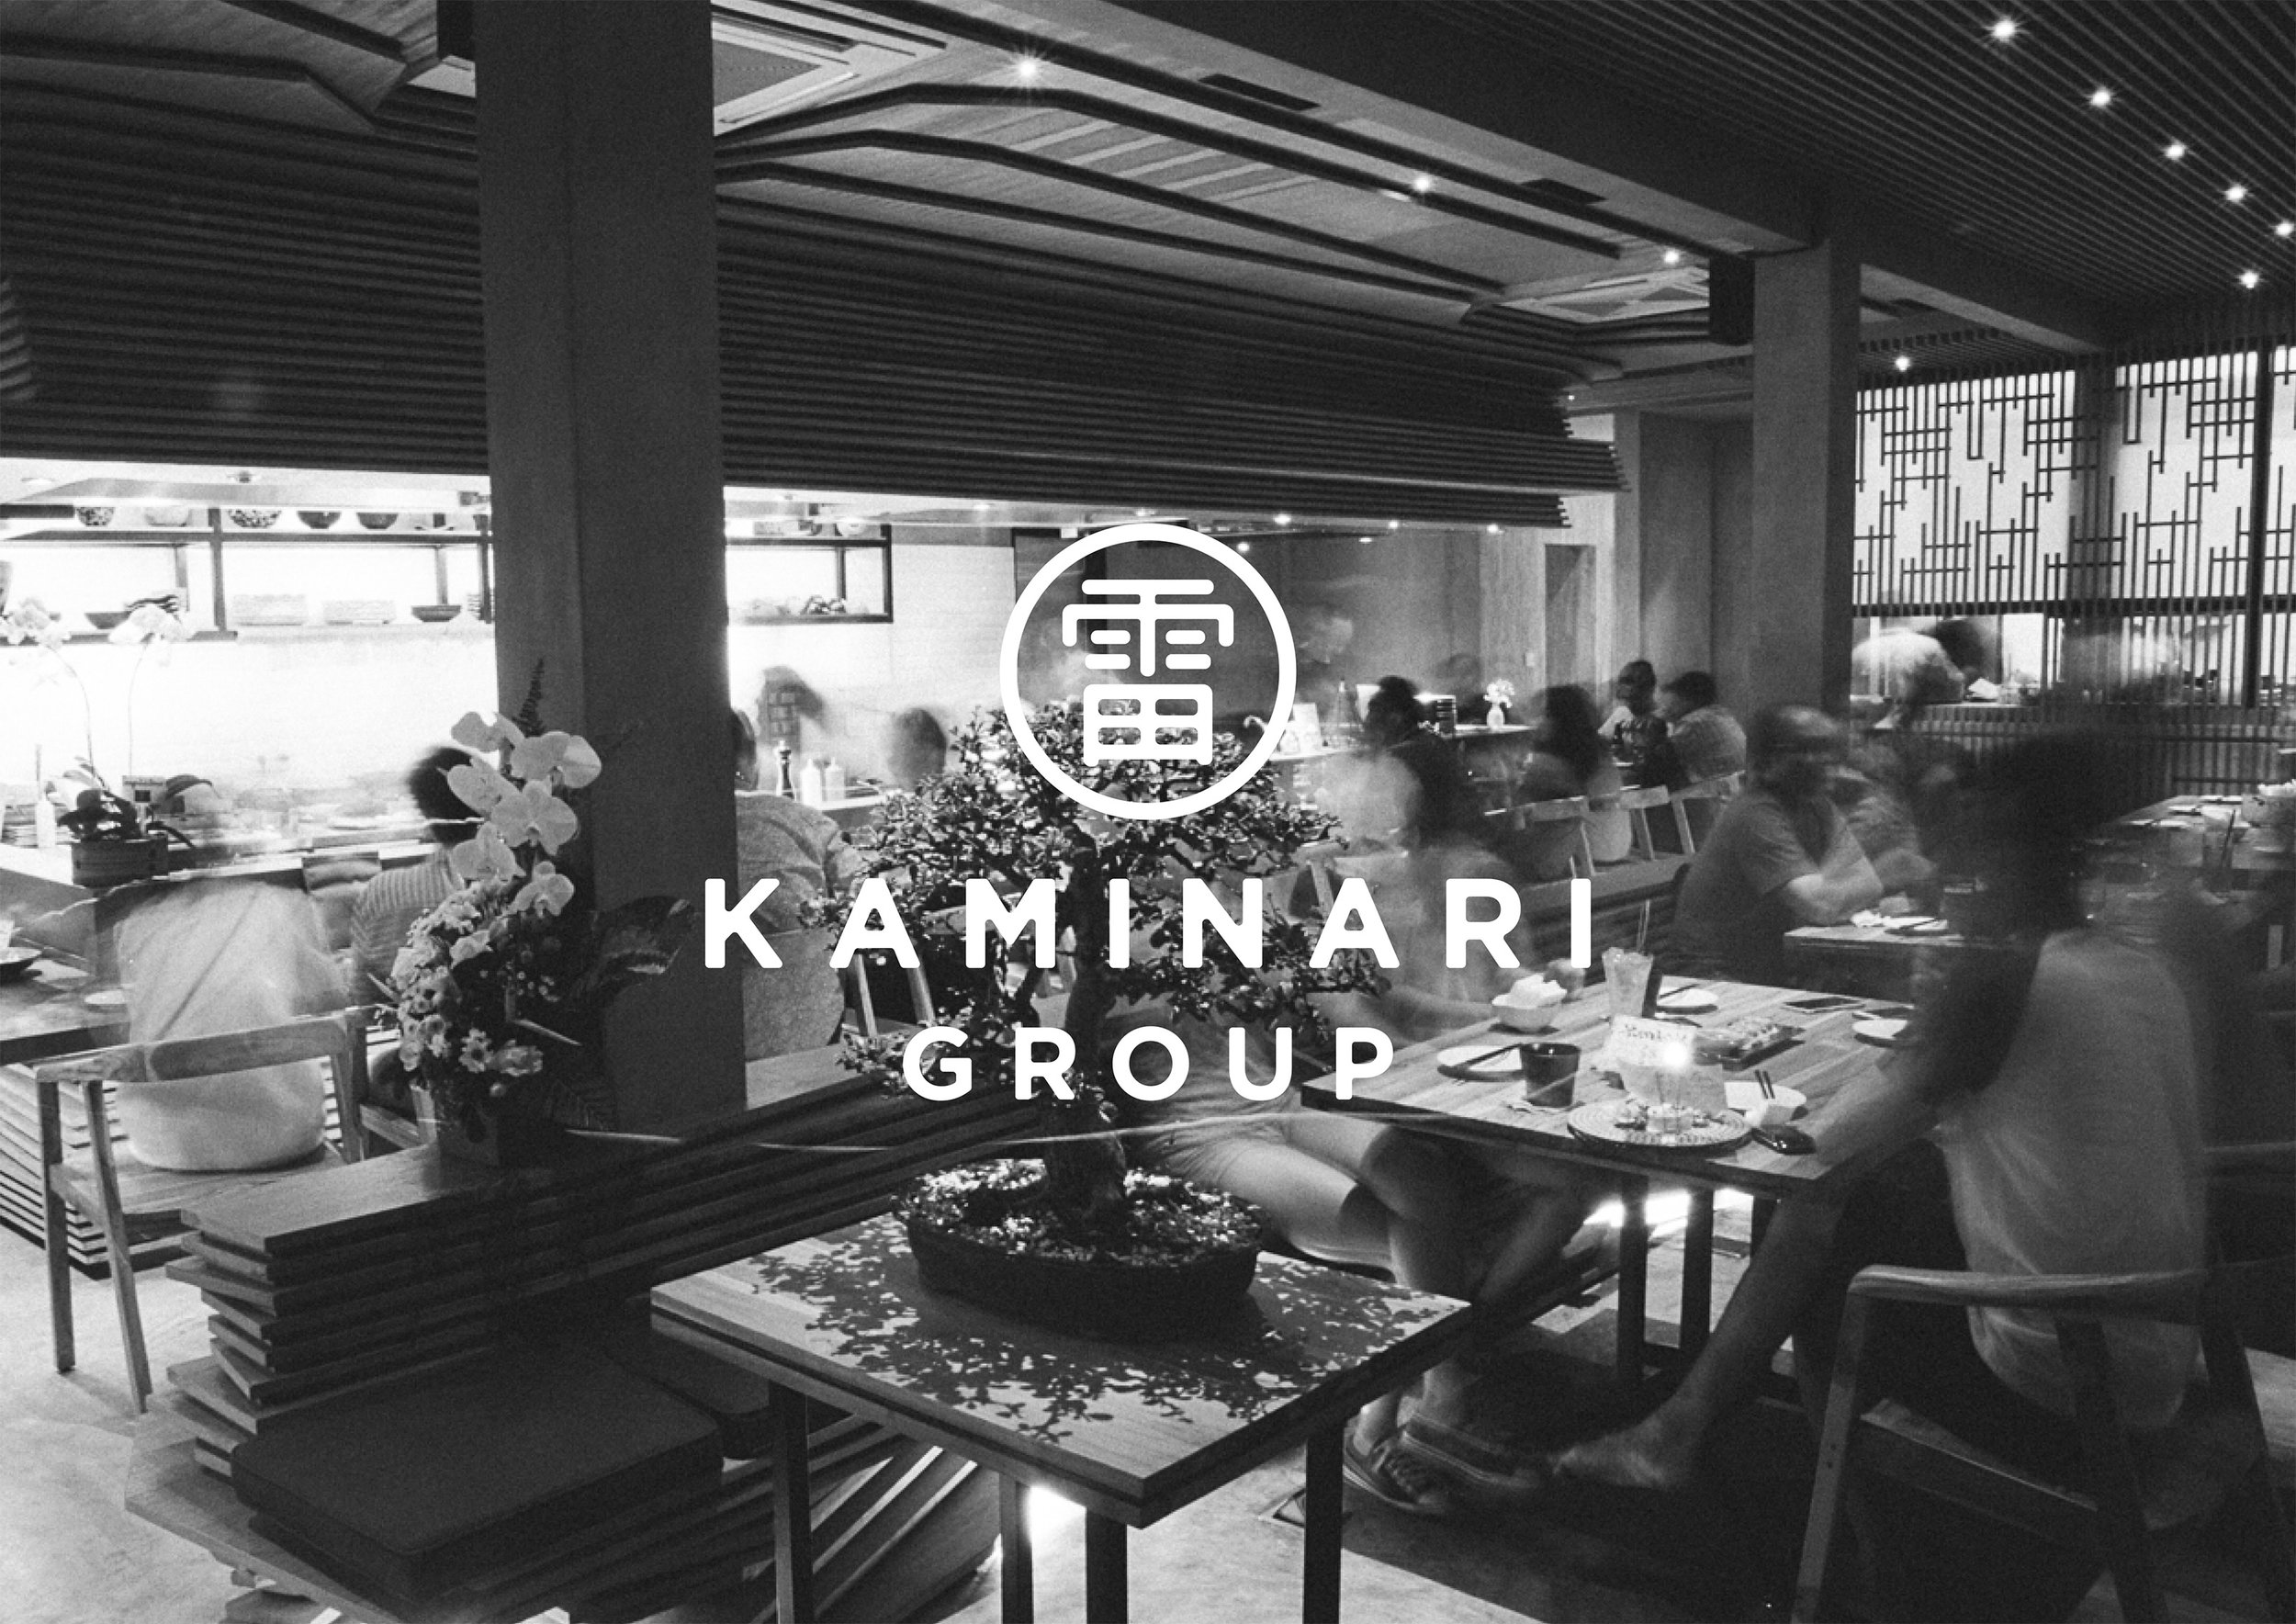 Kaminari Group - Japanese food catering and wedding vendor in Bali